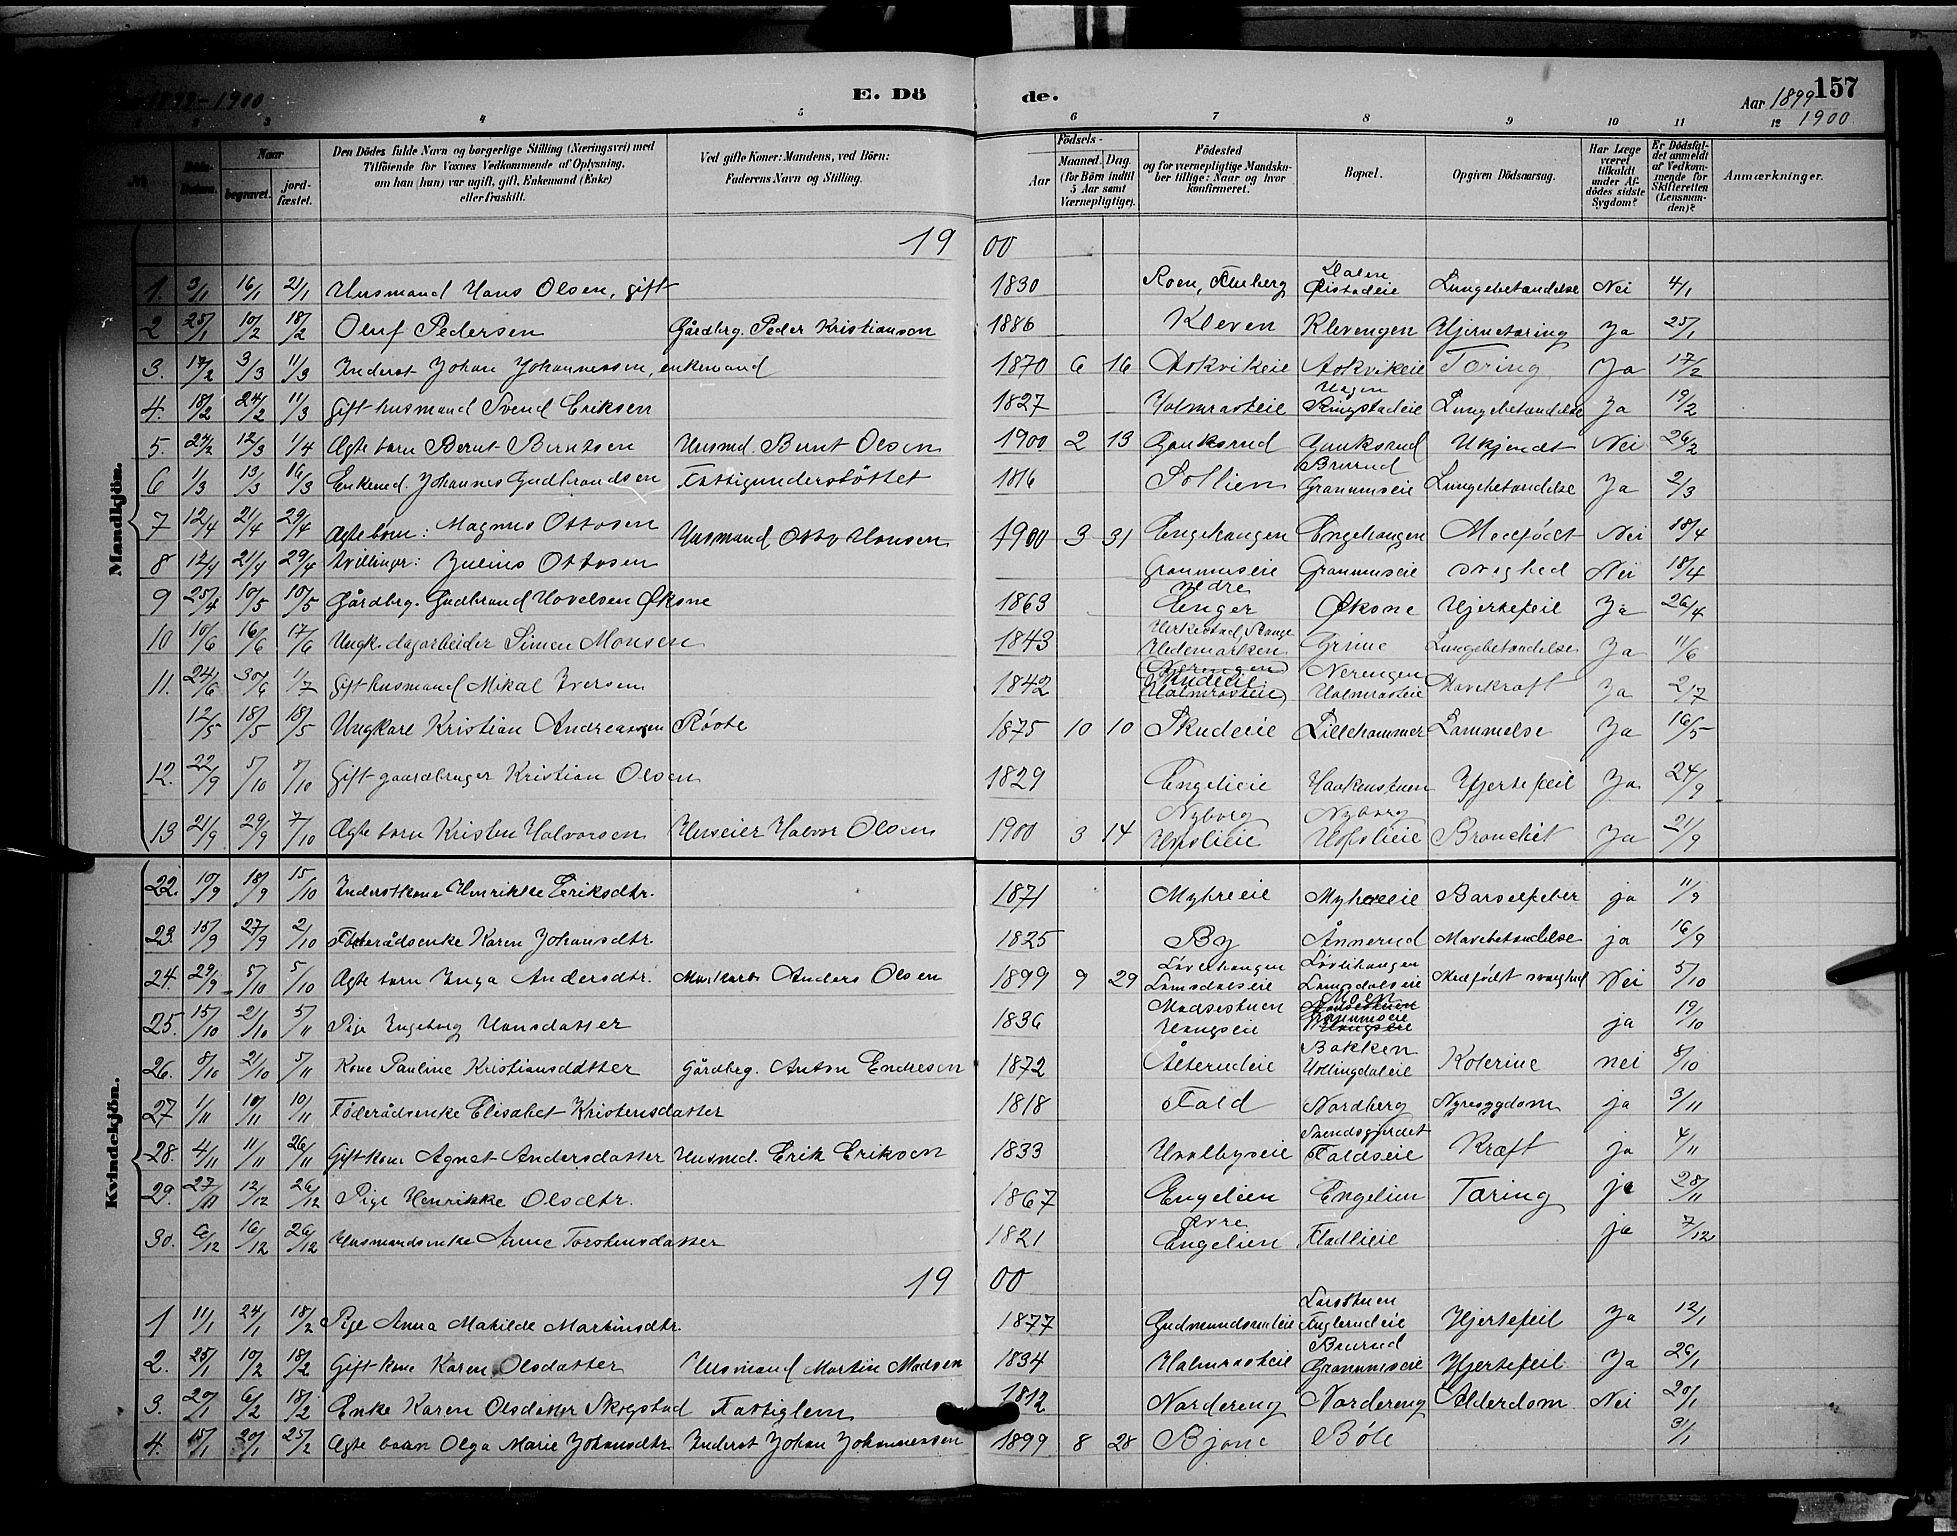 SAH, Søndre Land prestekontor, L/L0002: Klokkerbok nr. 2, 1884-1900, s. 157